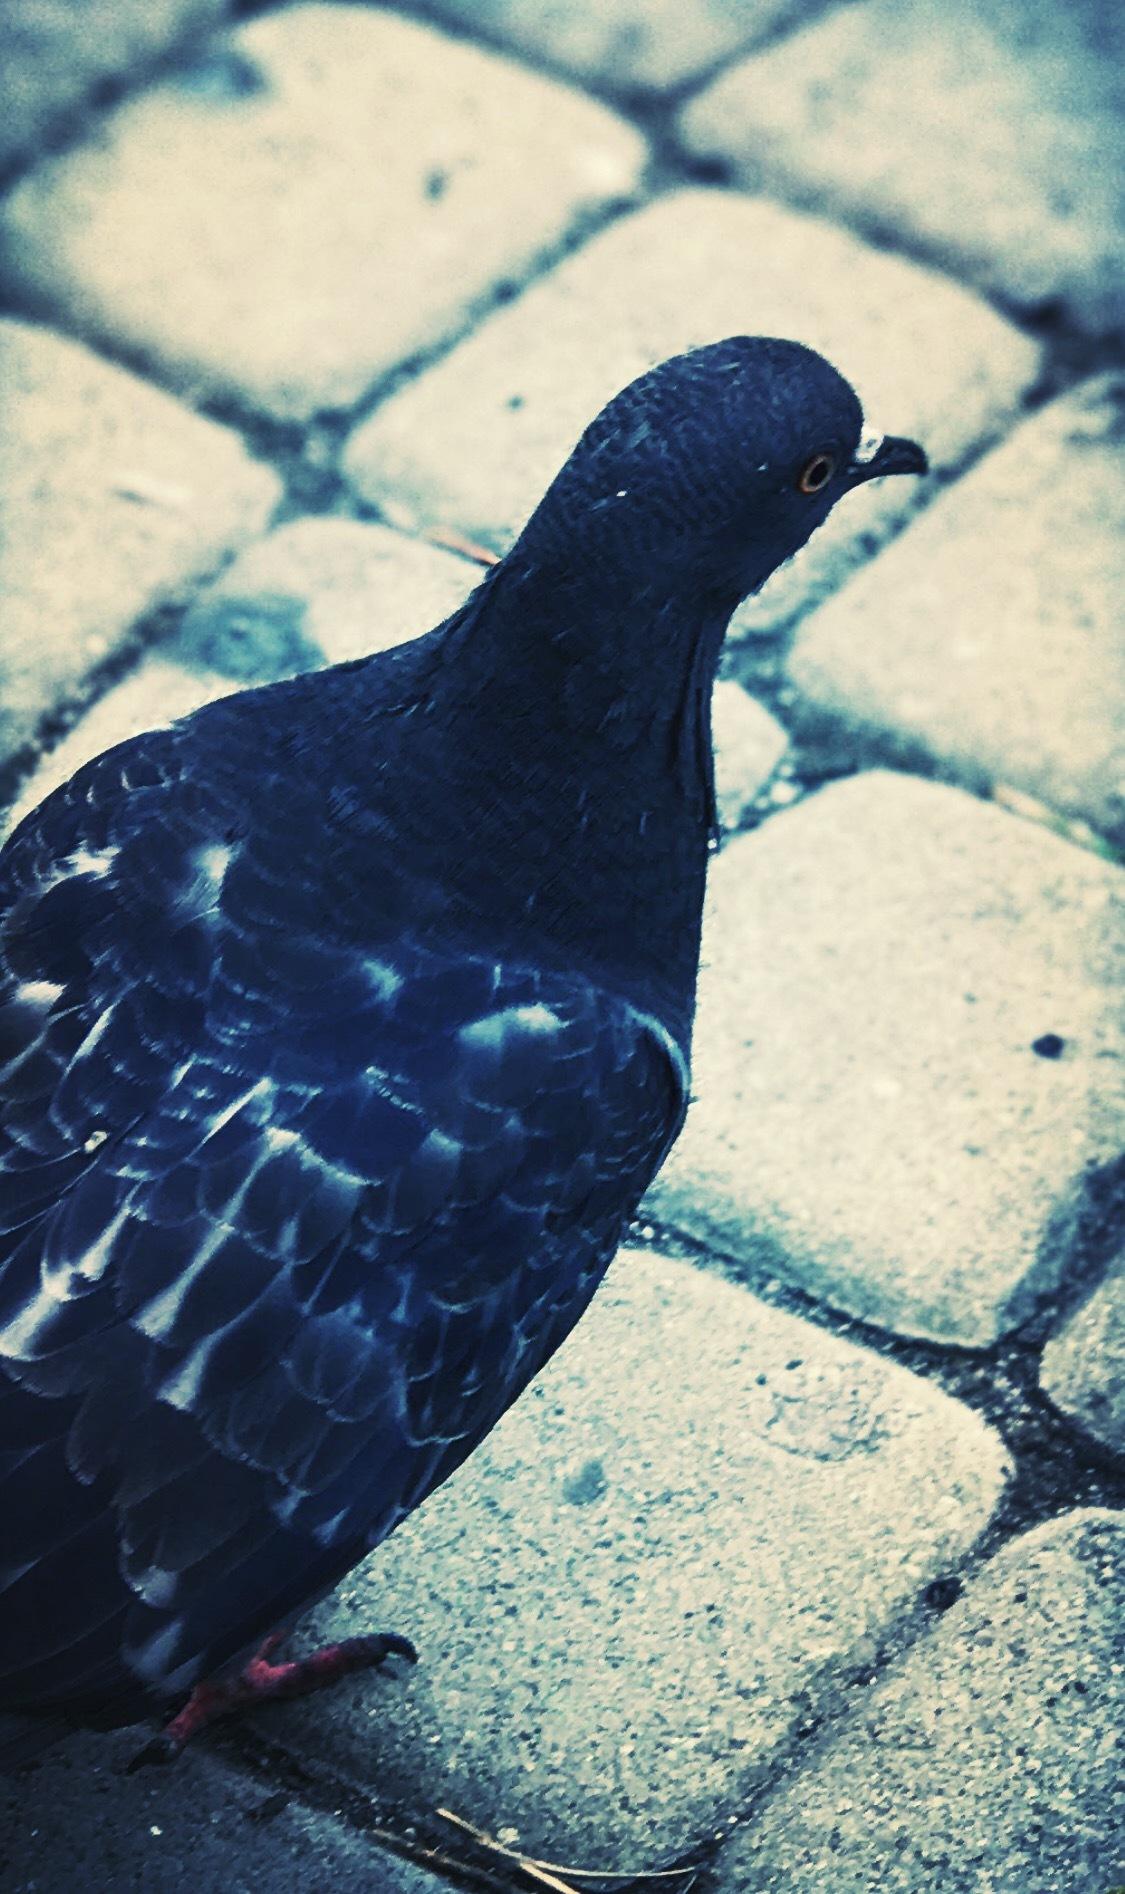 Pigeon by iensueno